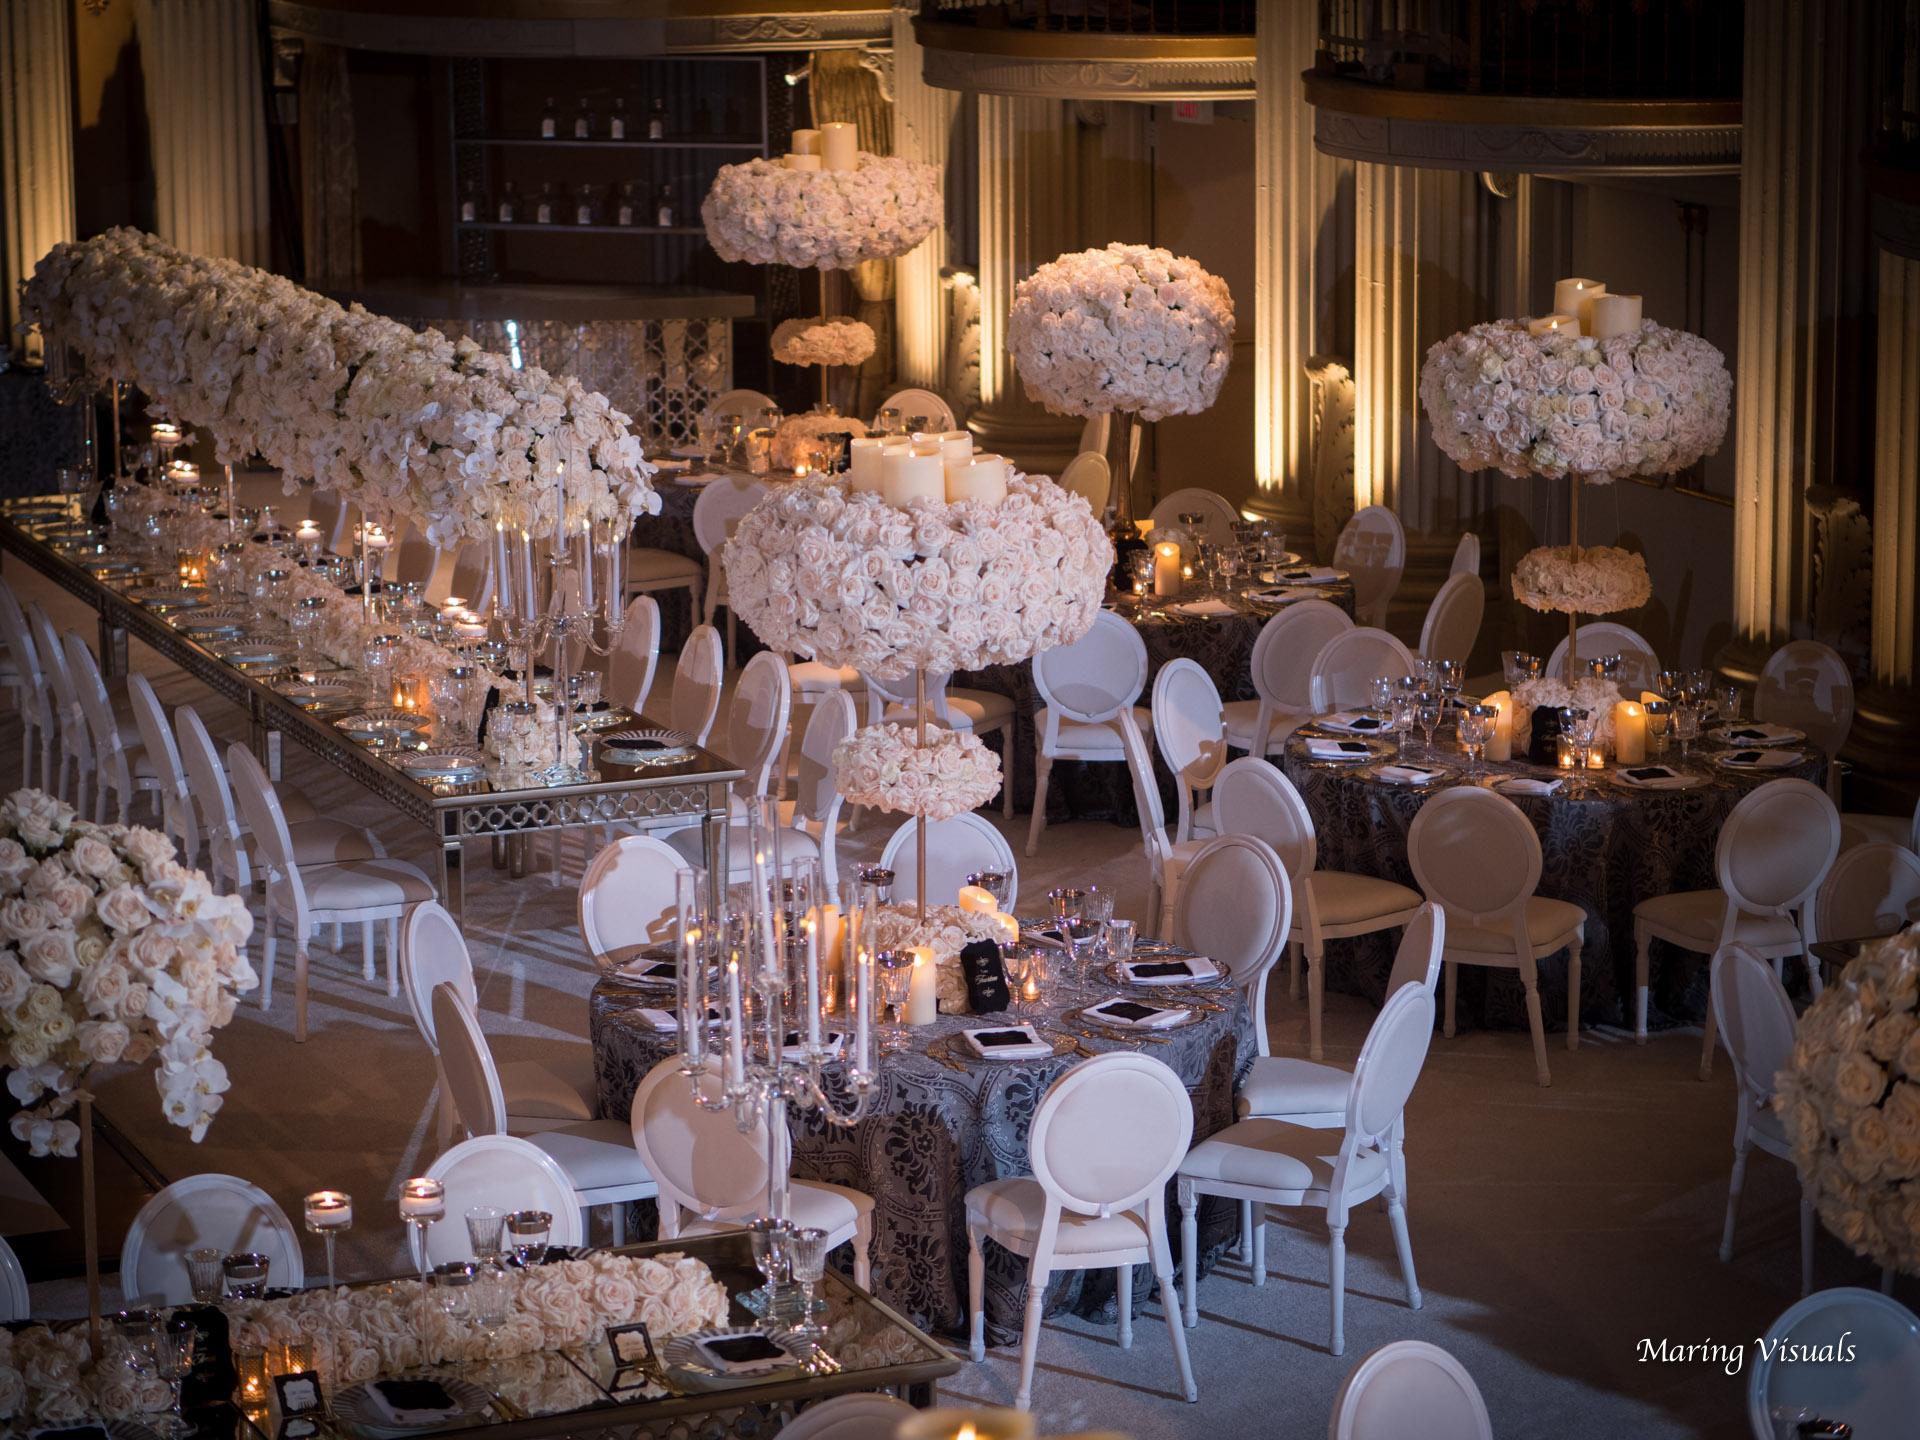 David Tutera Weddings by Maring Visuals 00544.jpg